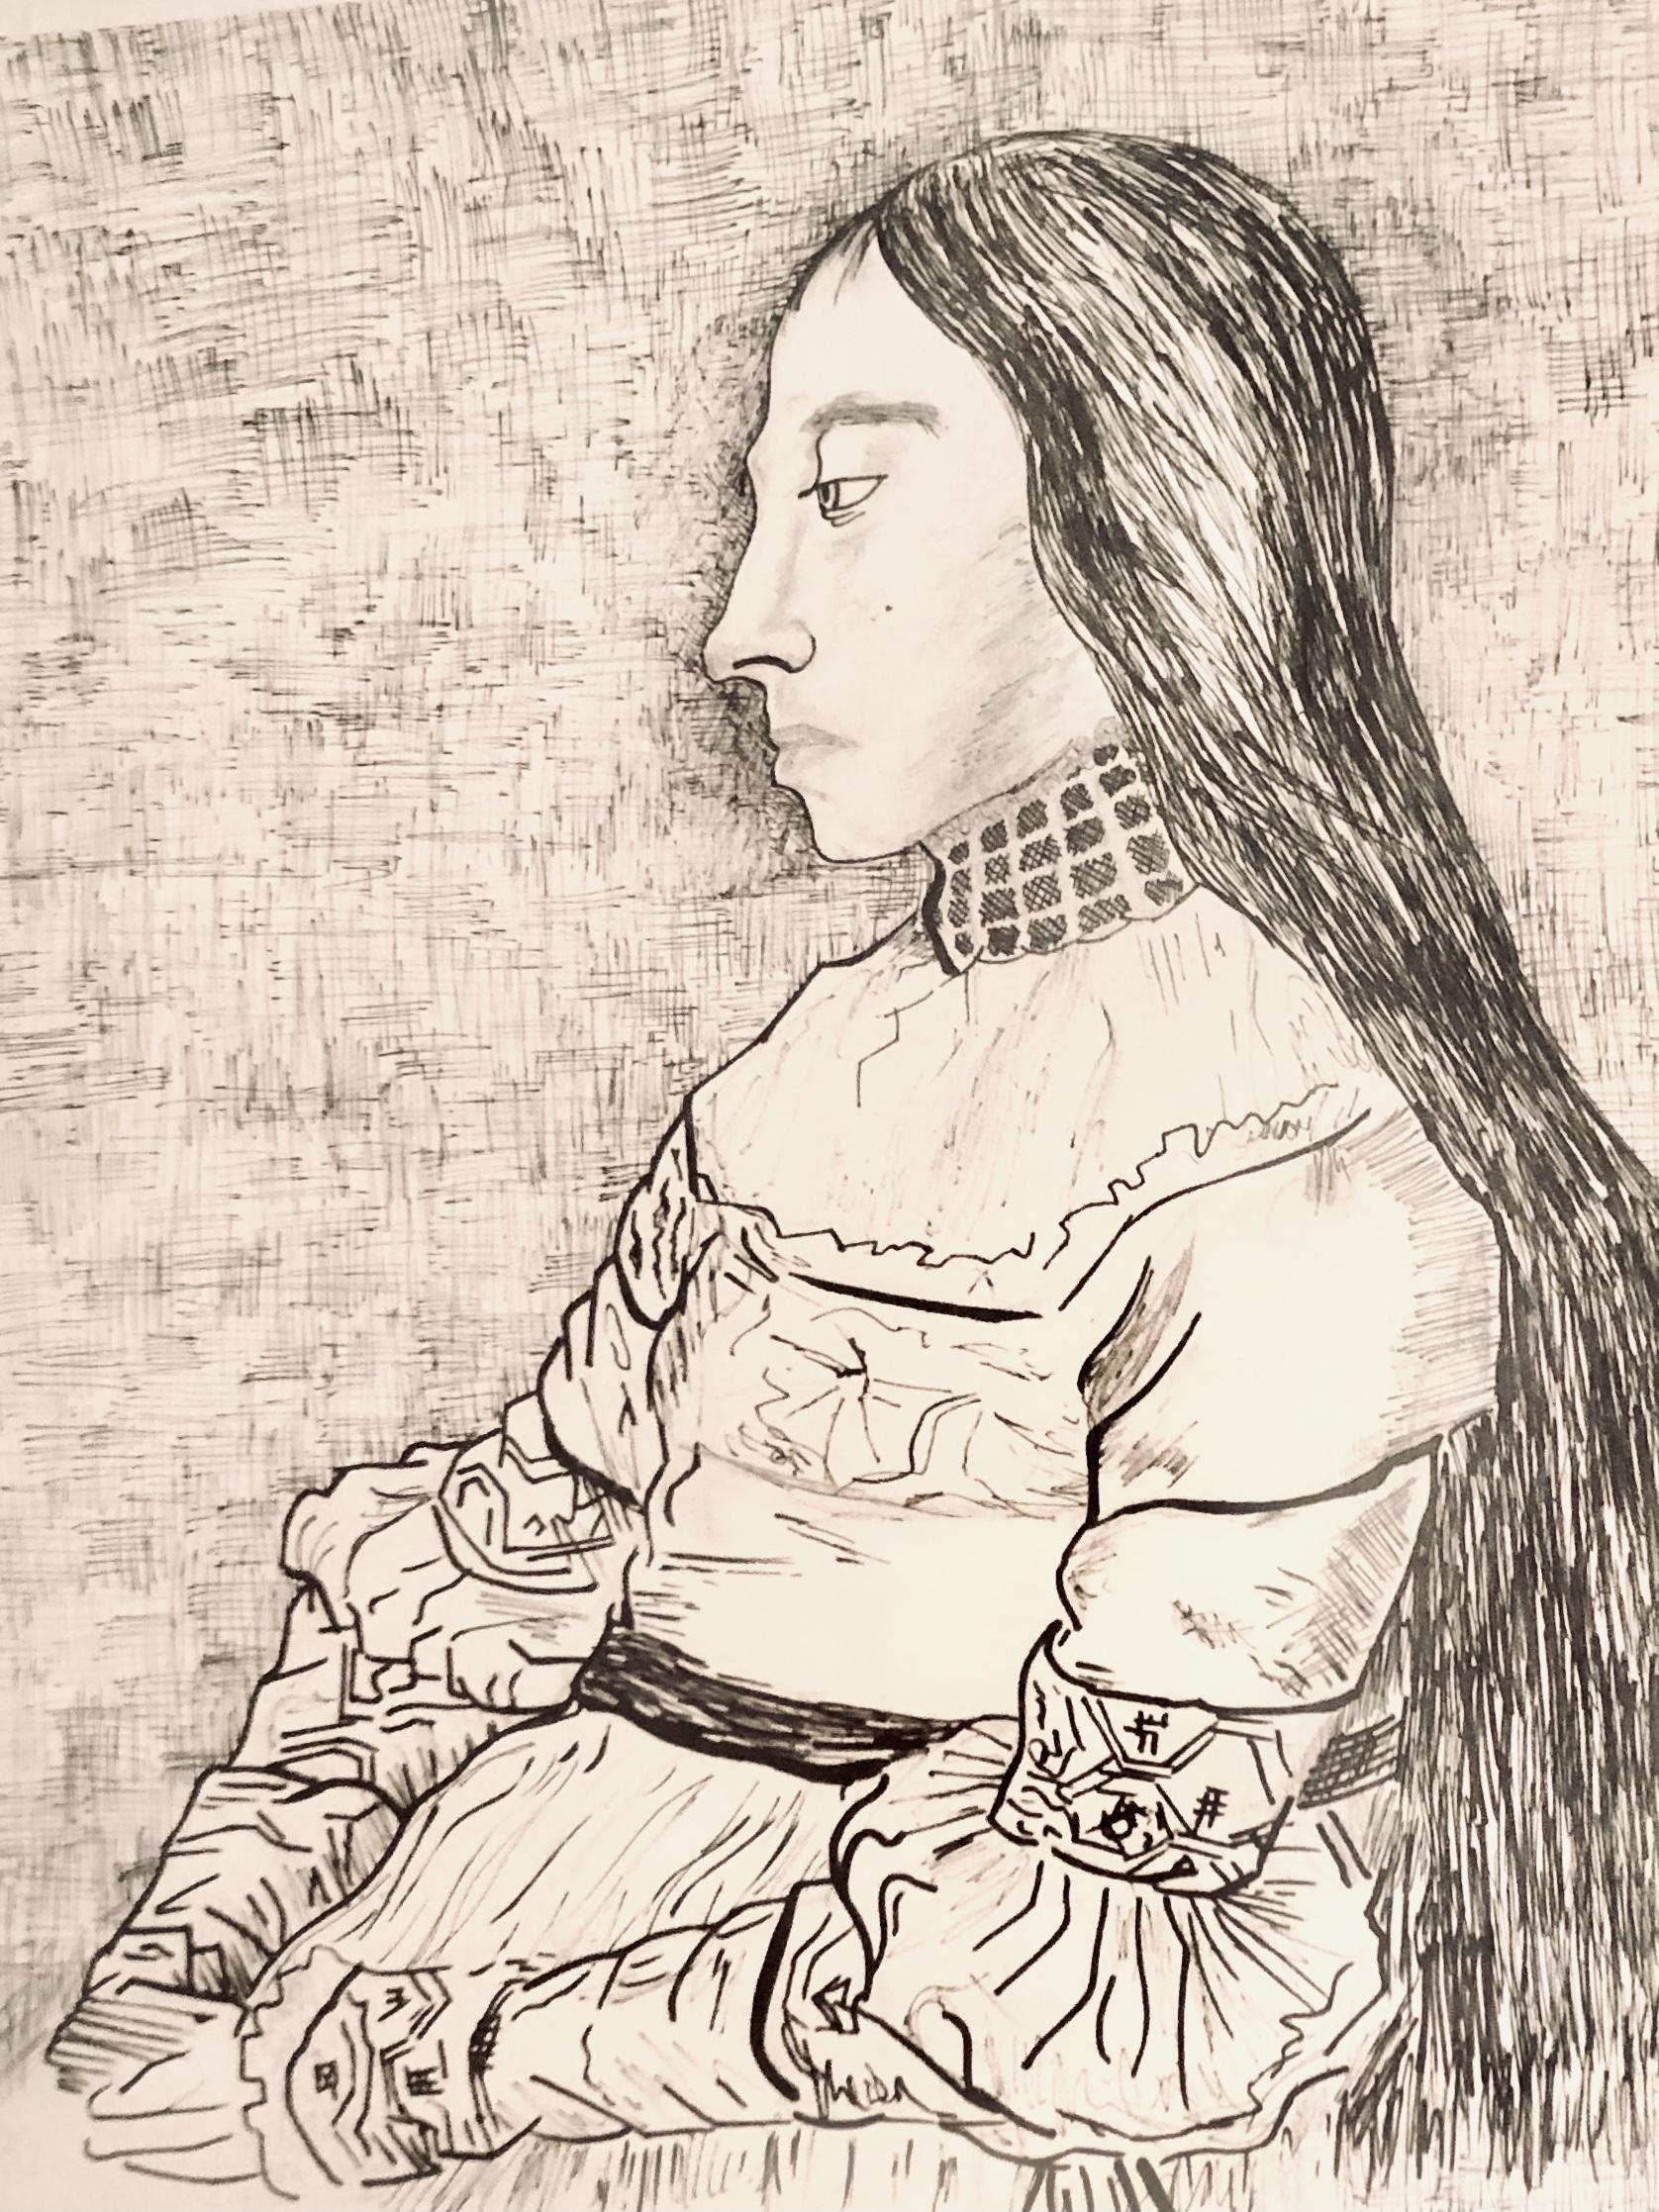 Replica of a Master Sketch